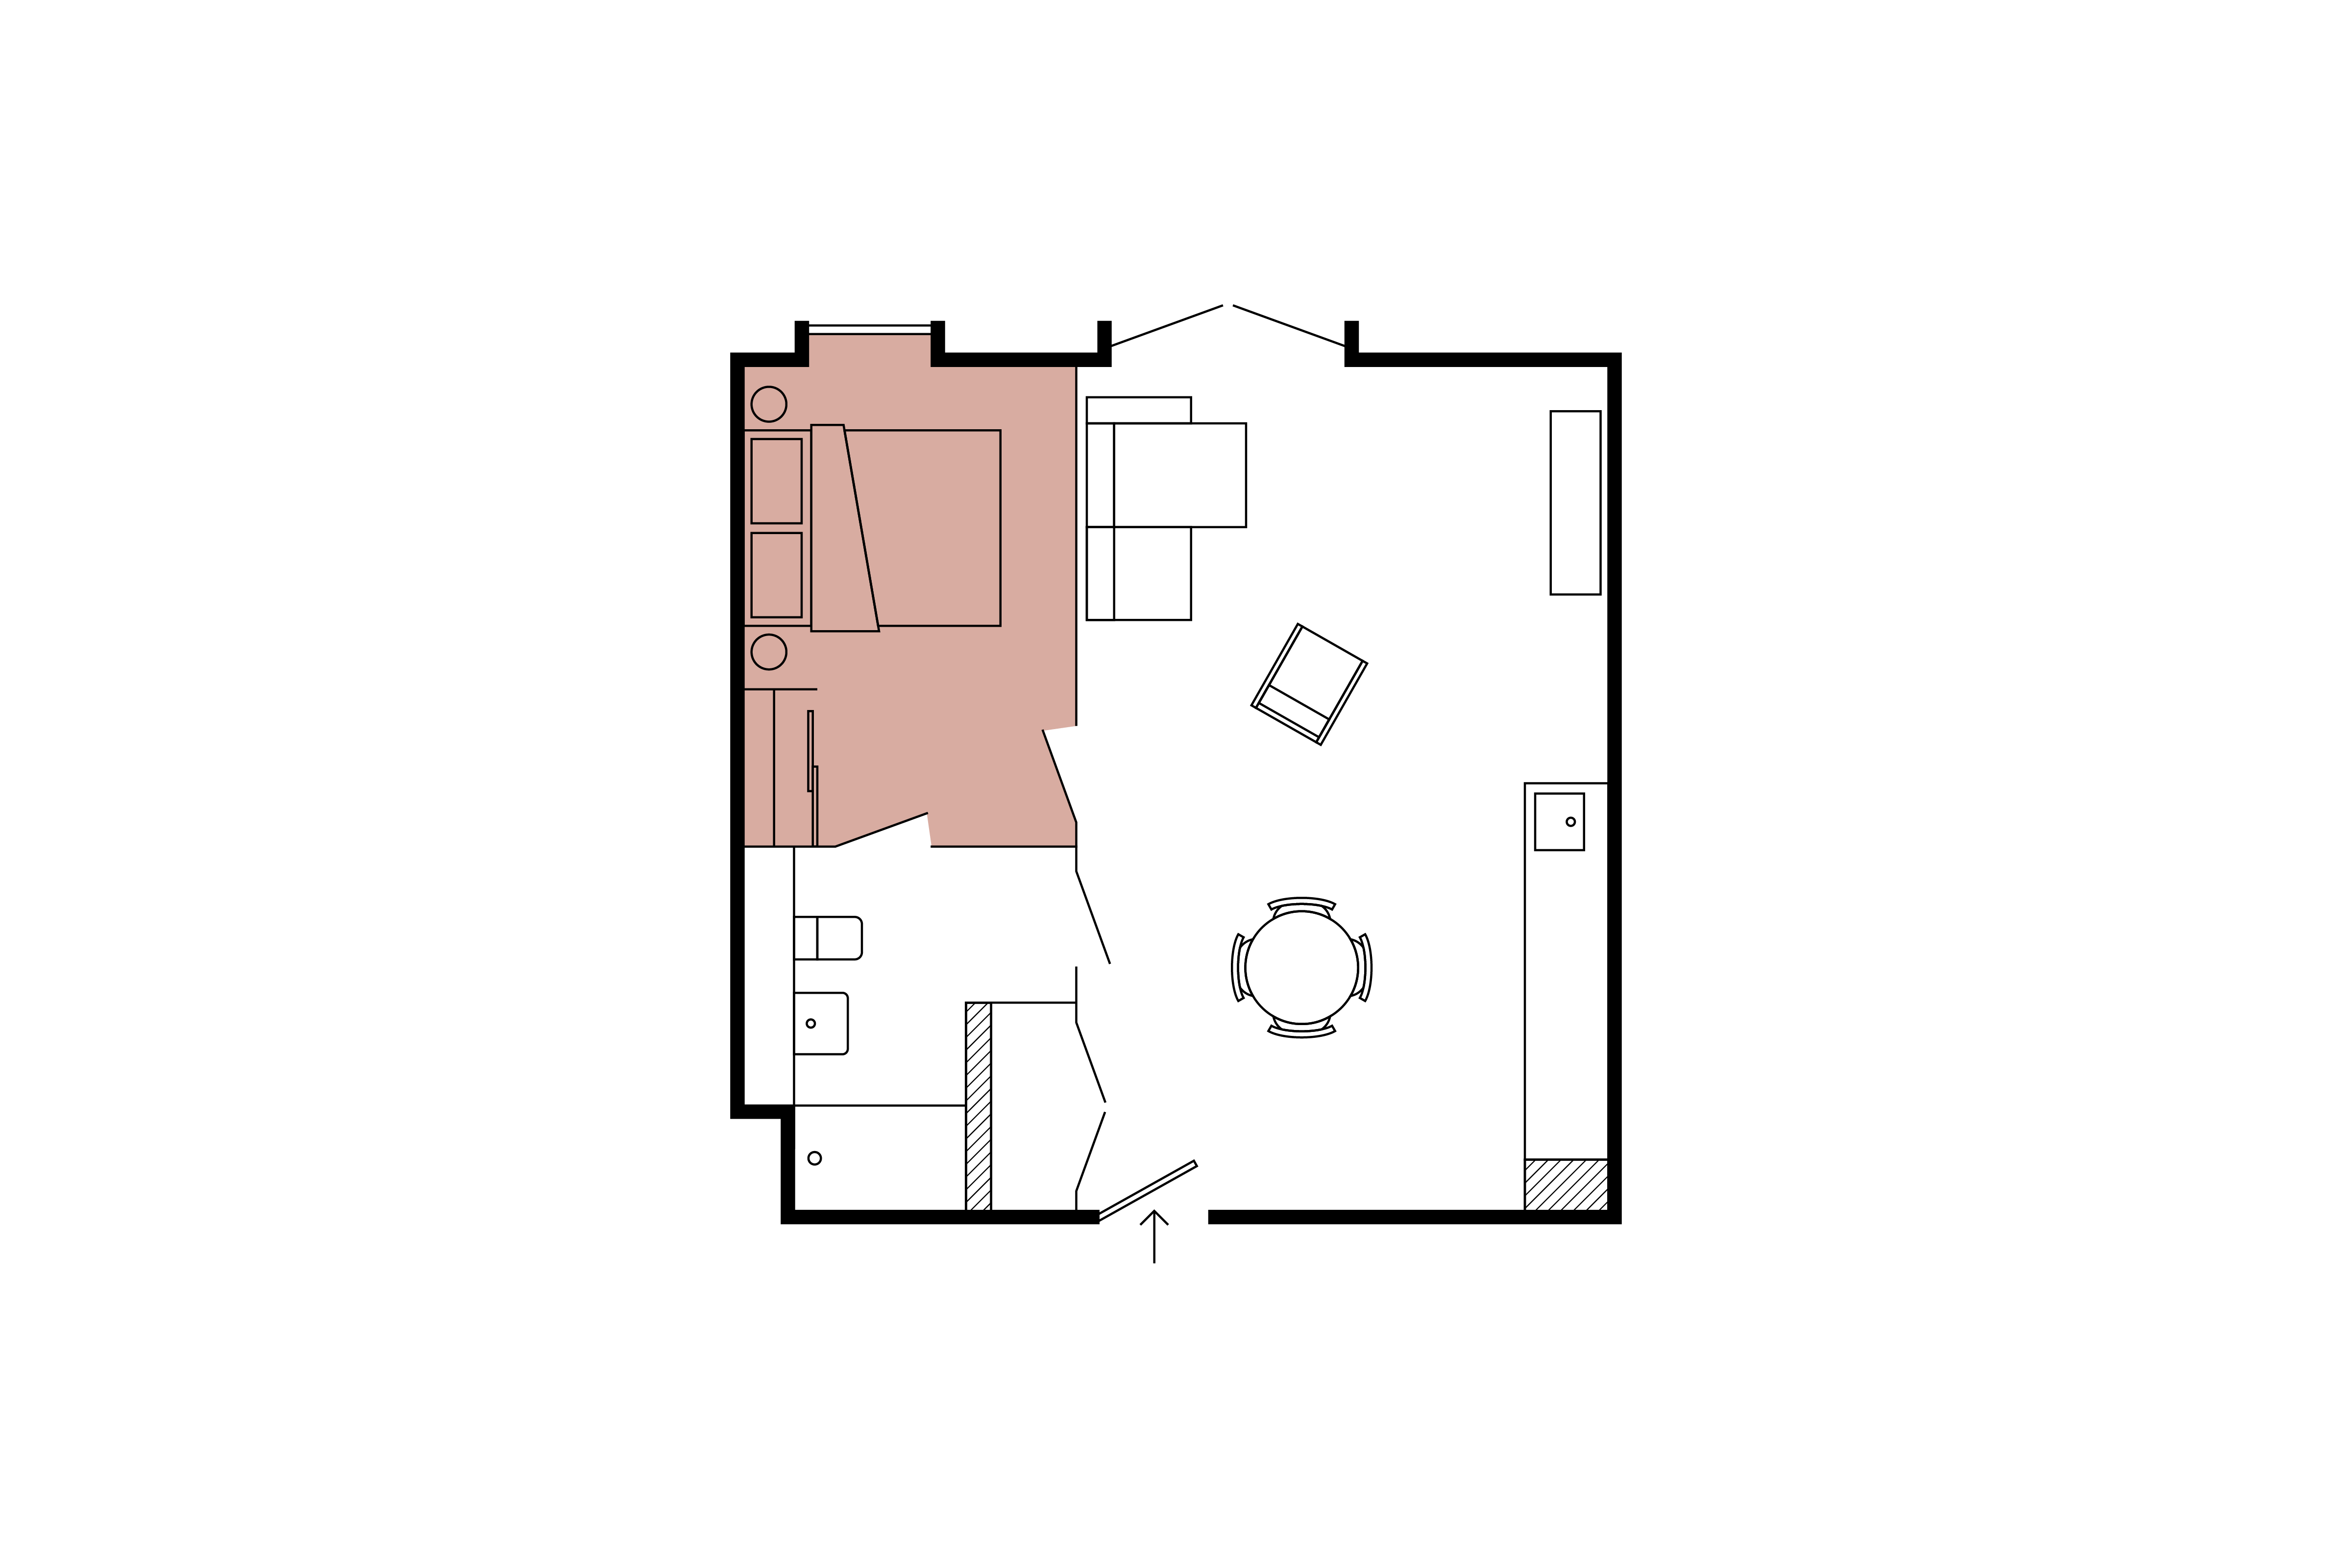 Floor plan for 1 Bed – North Block